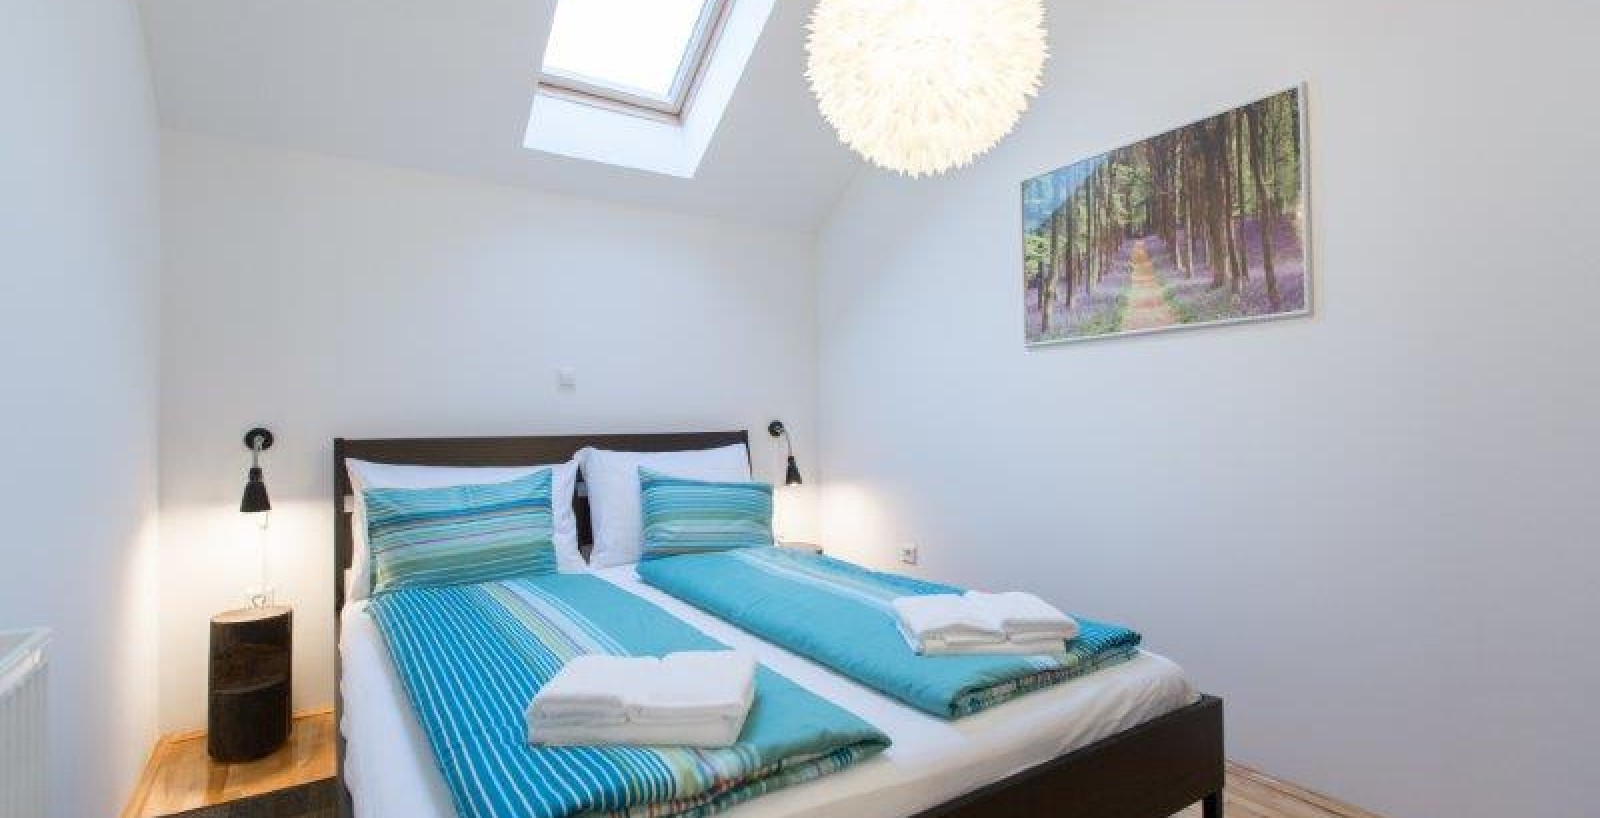 TARA GARDEN - rooms and apartments